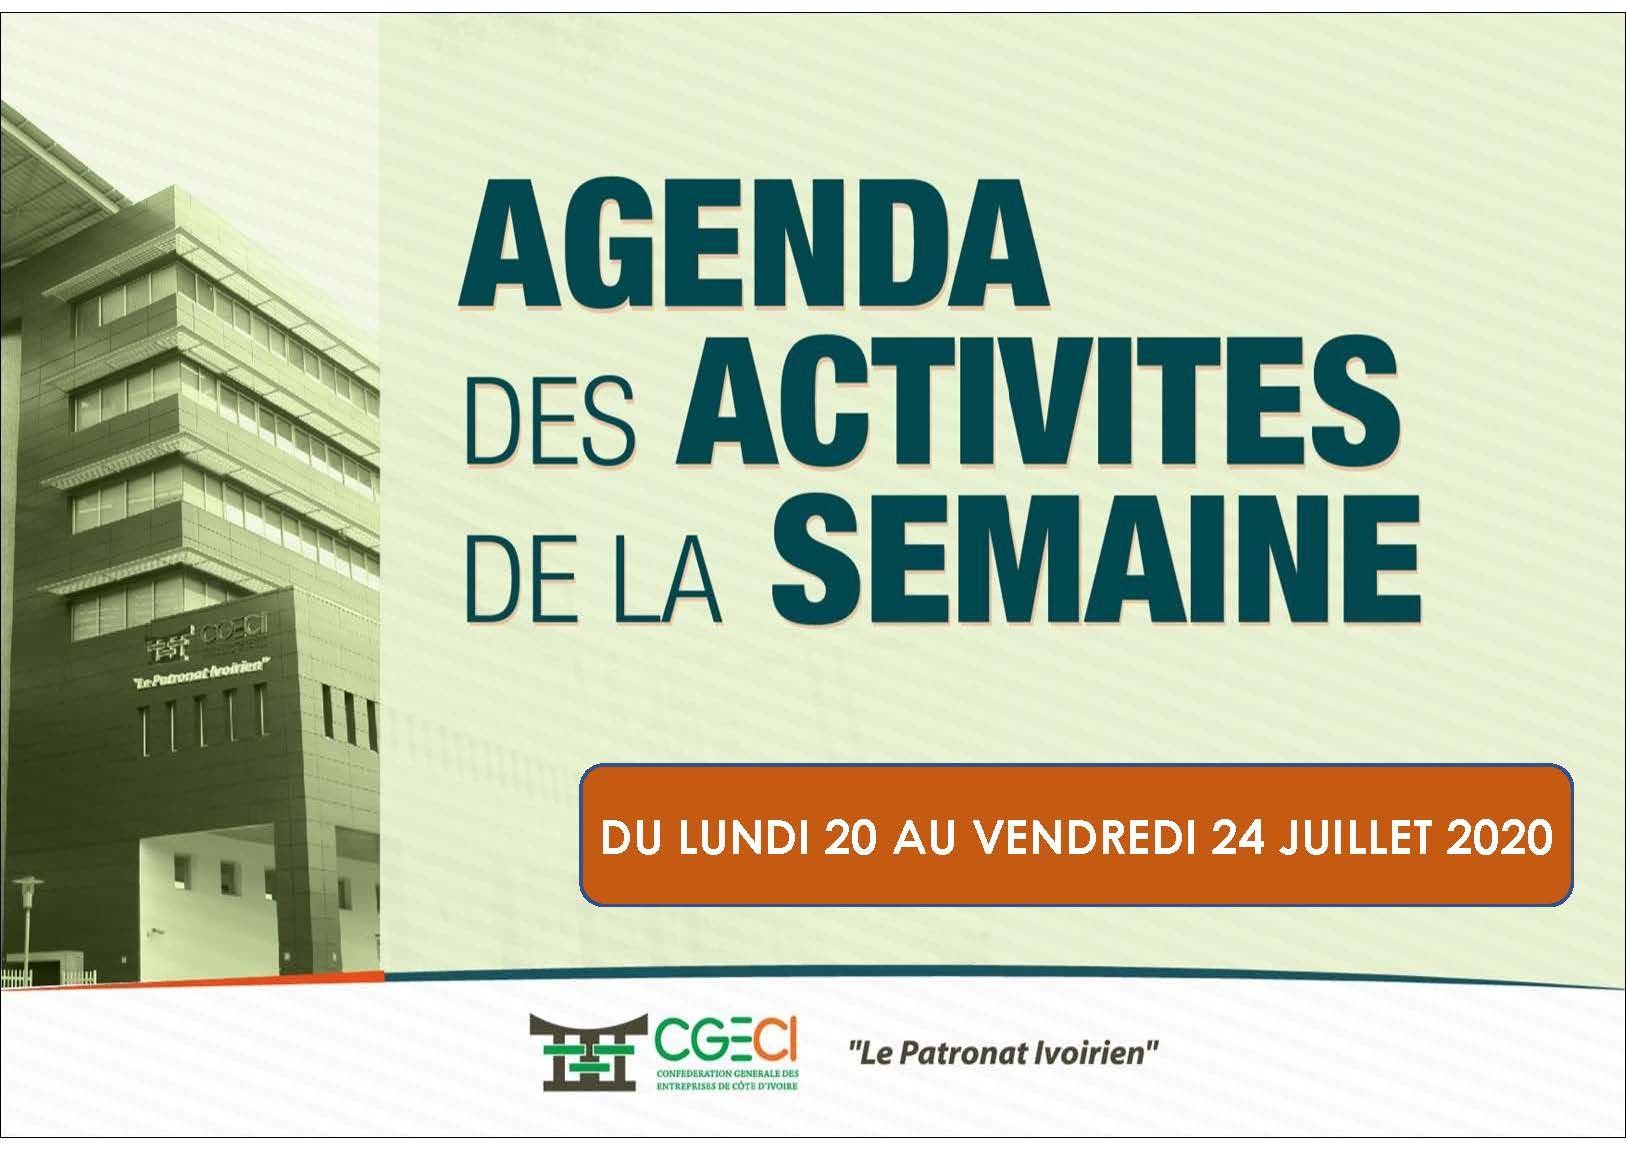 AGENDA DE LA SEMAINE DU 20 AU 24 JUILLET 2020